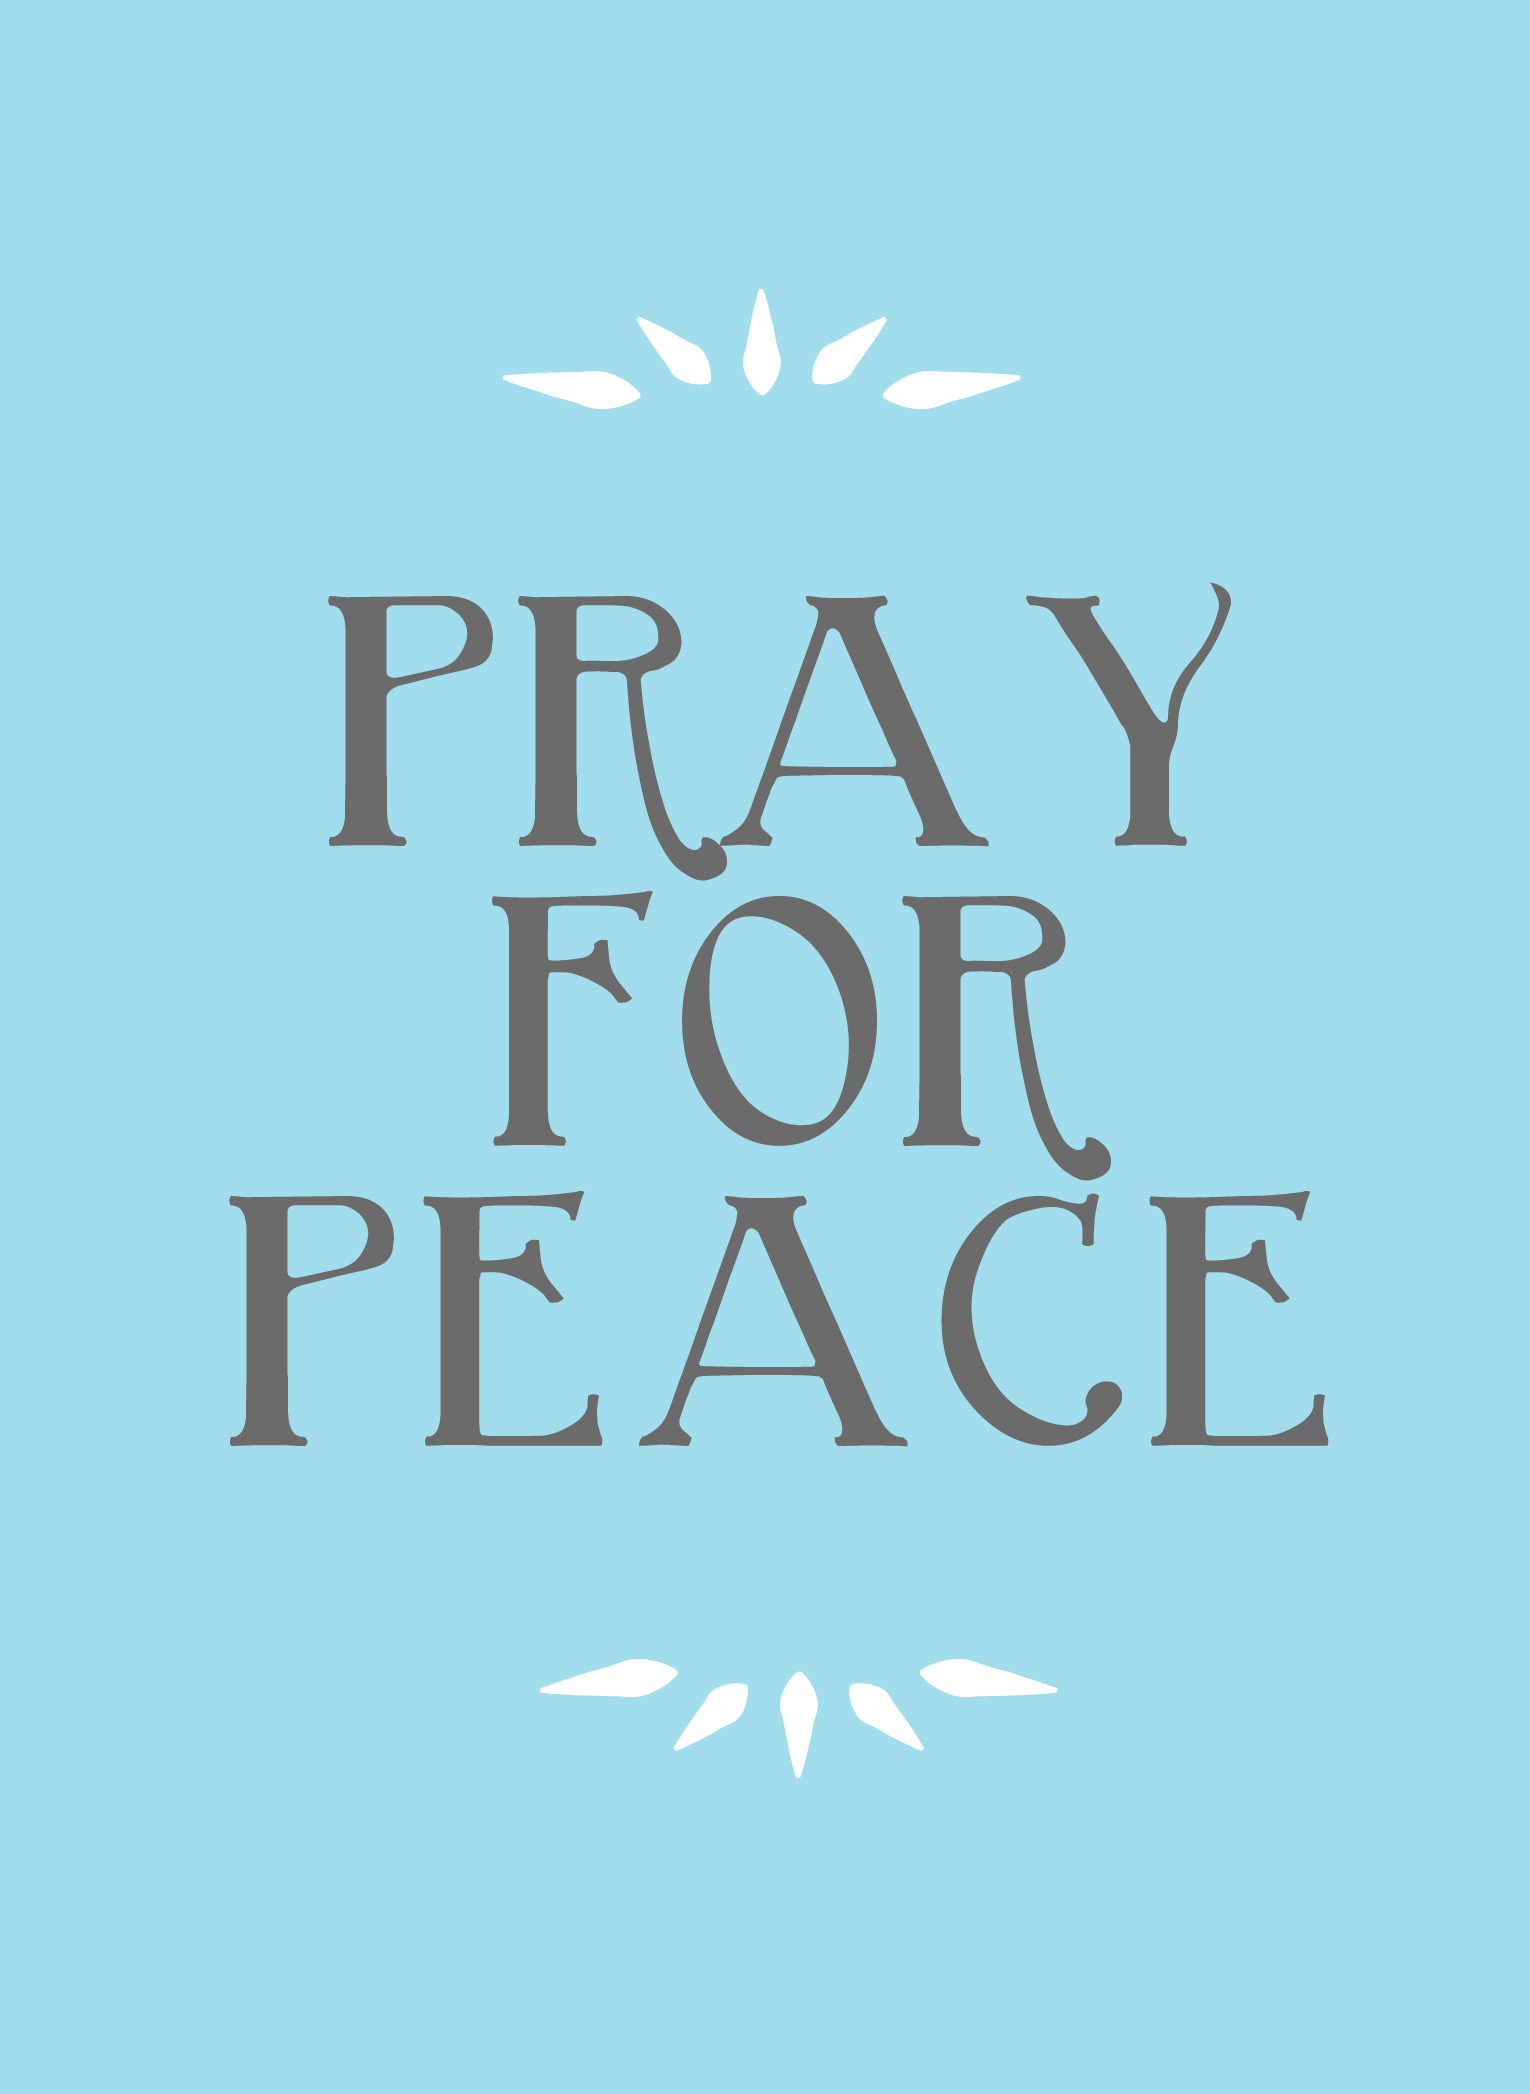 http://www.honeybearlane.com/wp-content/uploads/2012/12/pray-for-peace.jpg